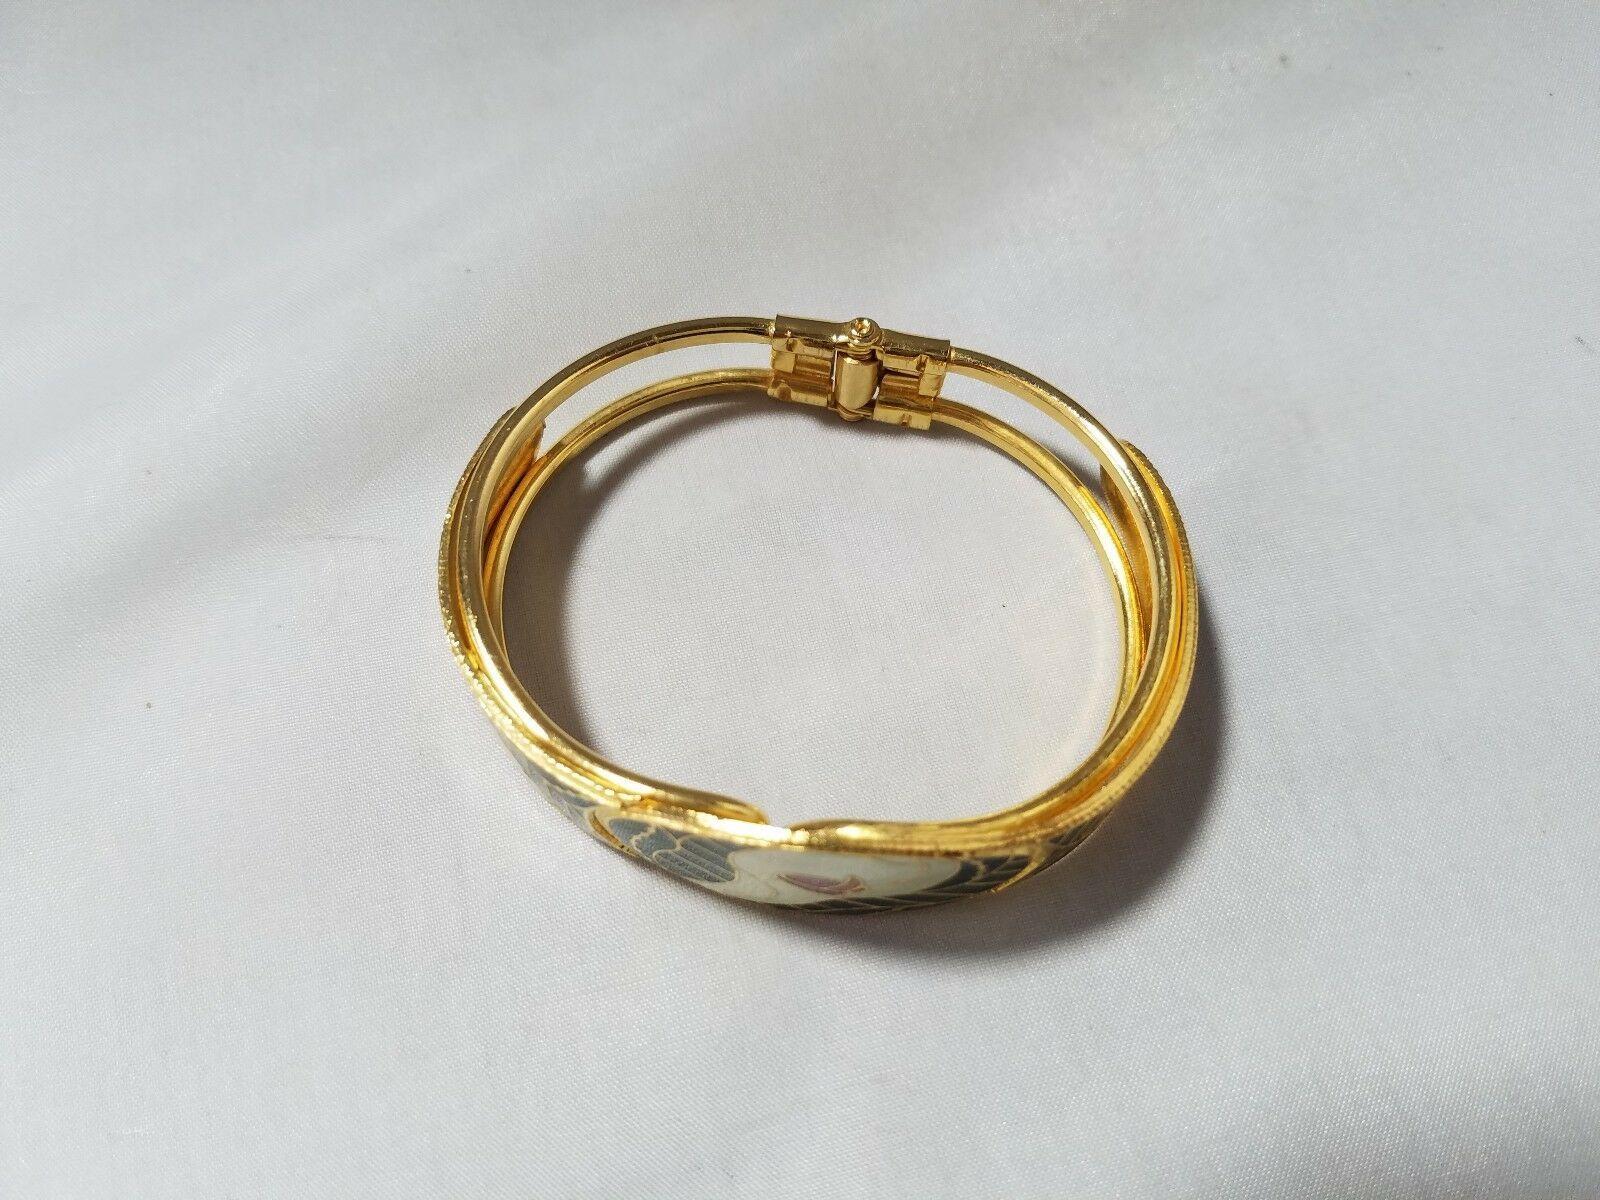 Vintage Fashion Jewelry Set Gold Tone Green Enamel Bracelet & 2 Pair Earrings